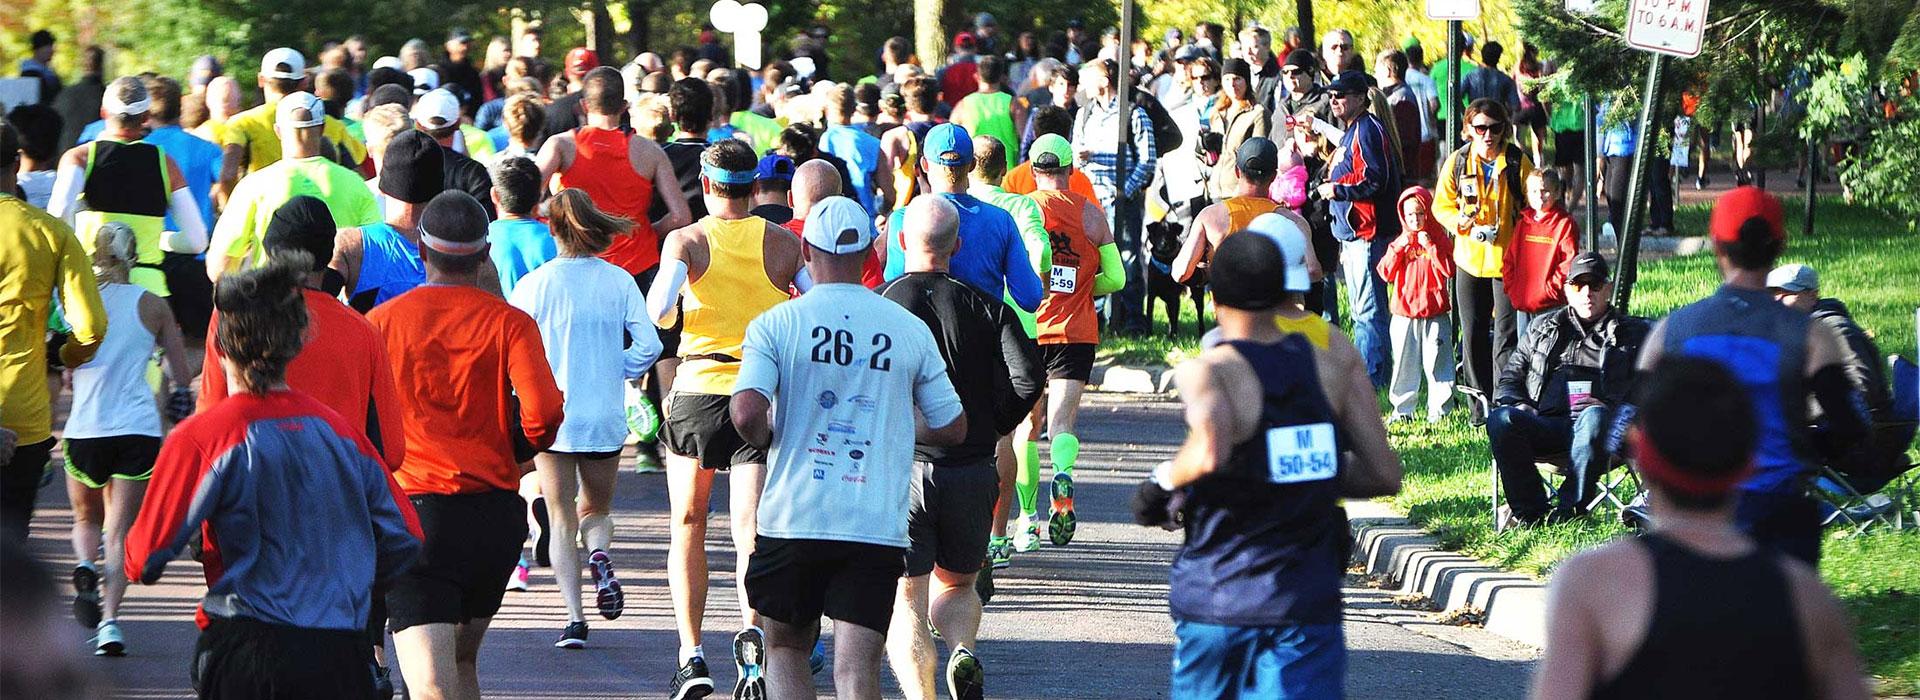 sistime-capa-mini-maratona-dos-veteranos-2016